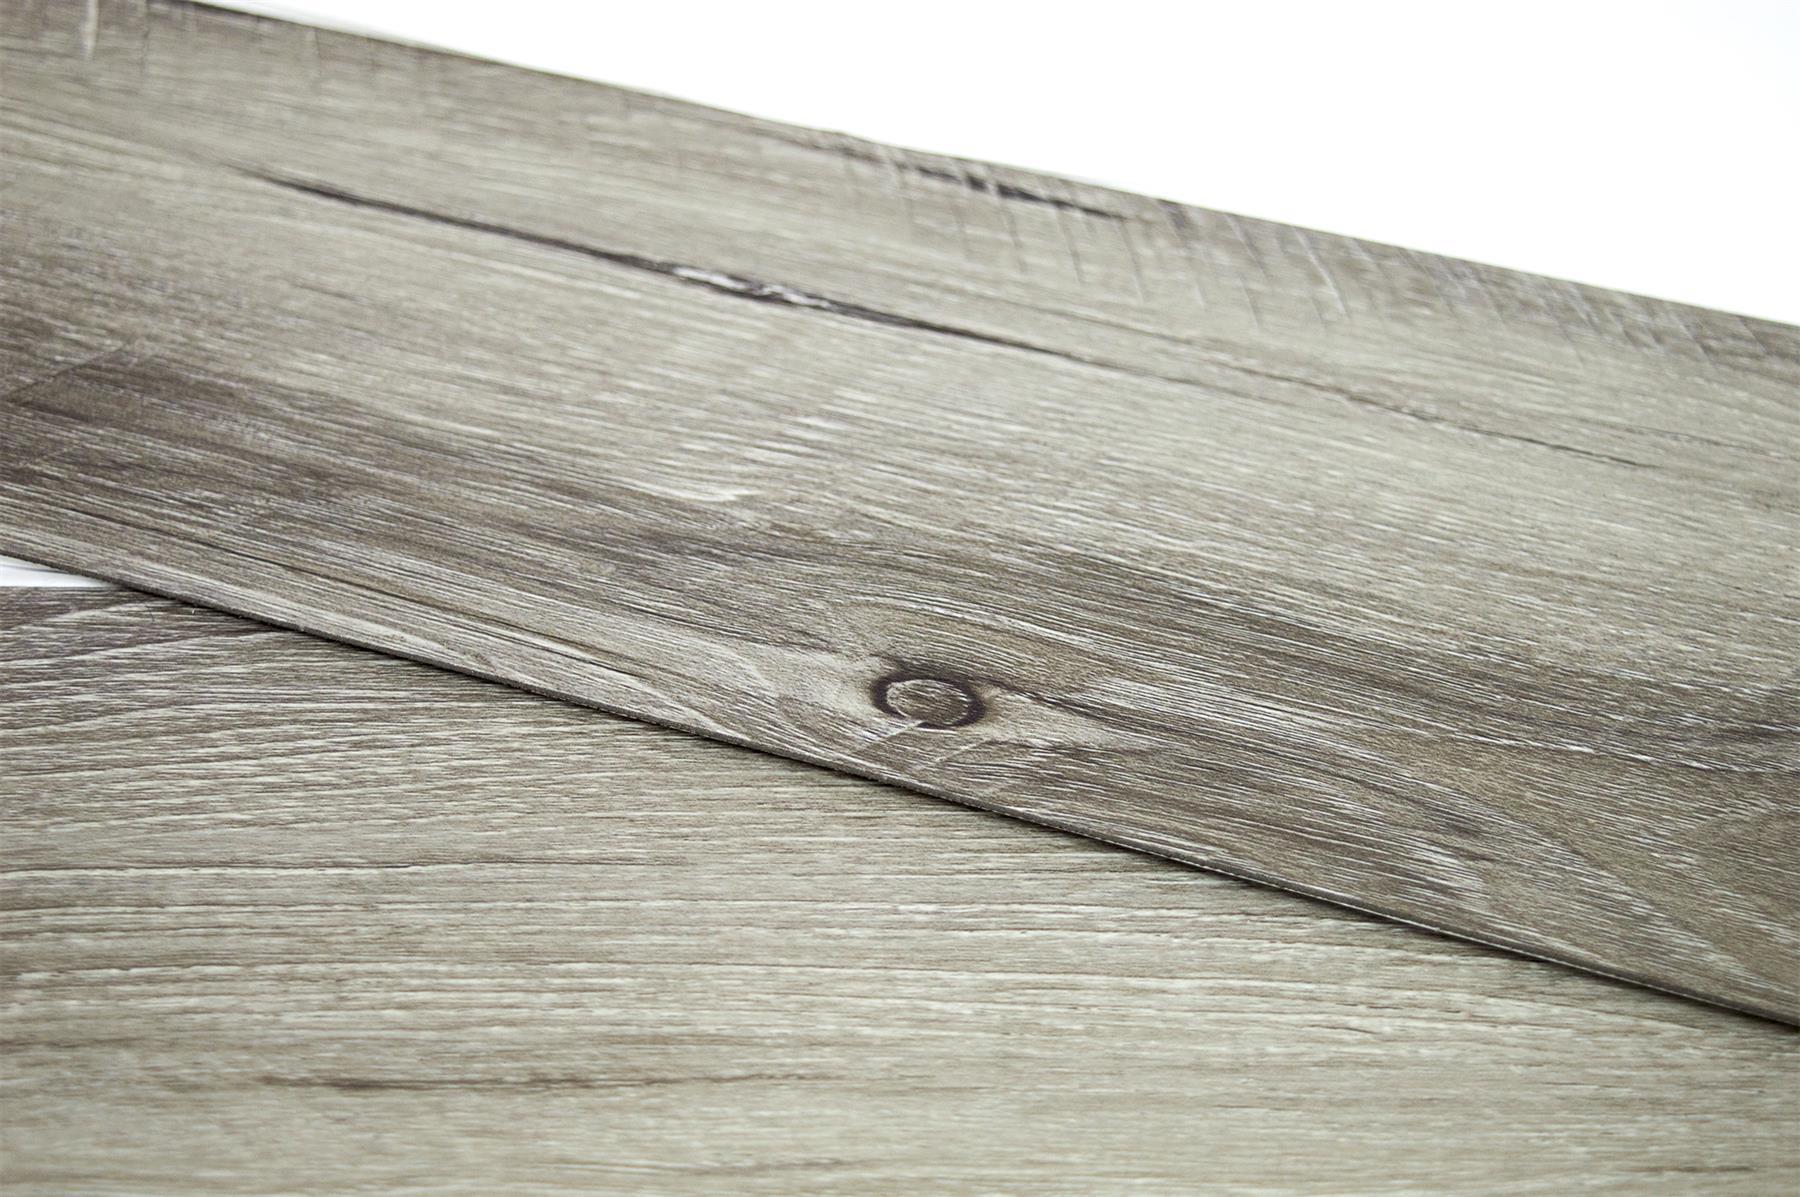 thumbnail 26 - Floor Planks Tiles Self Adhesive Dark Grey Wood Vinyl Flooring Kitchen Bathroom